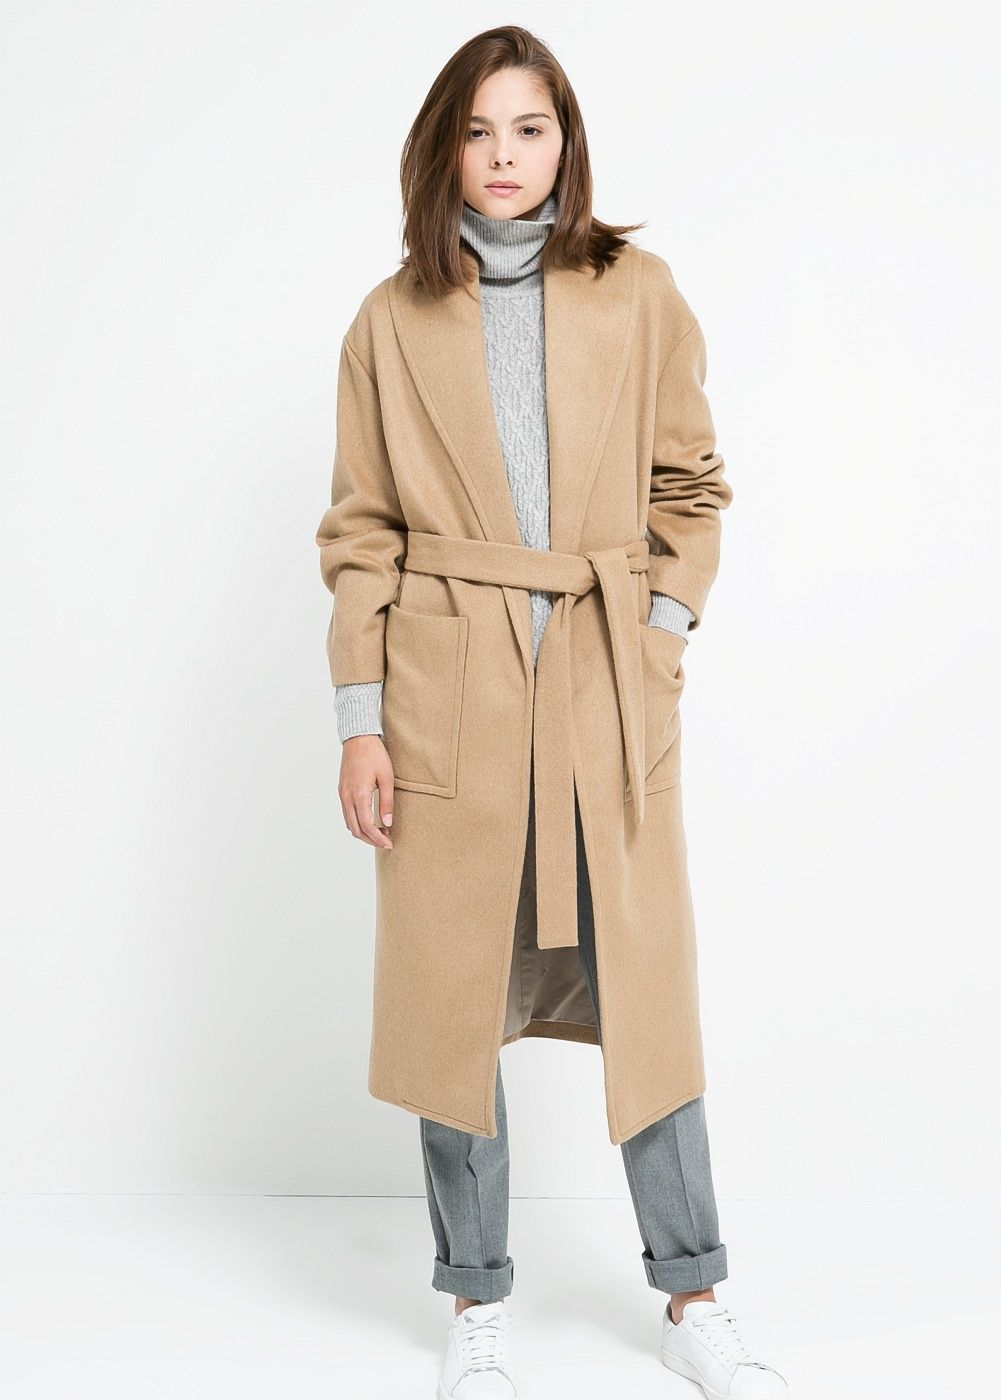 ef8fd0e6b0a0 Manteau en laine avec ceinture - Femme   Things to Wear   Pinterest ...